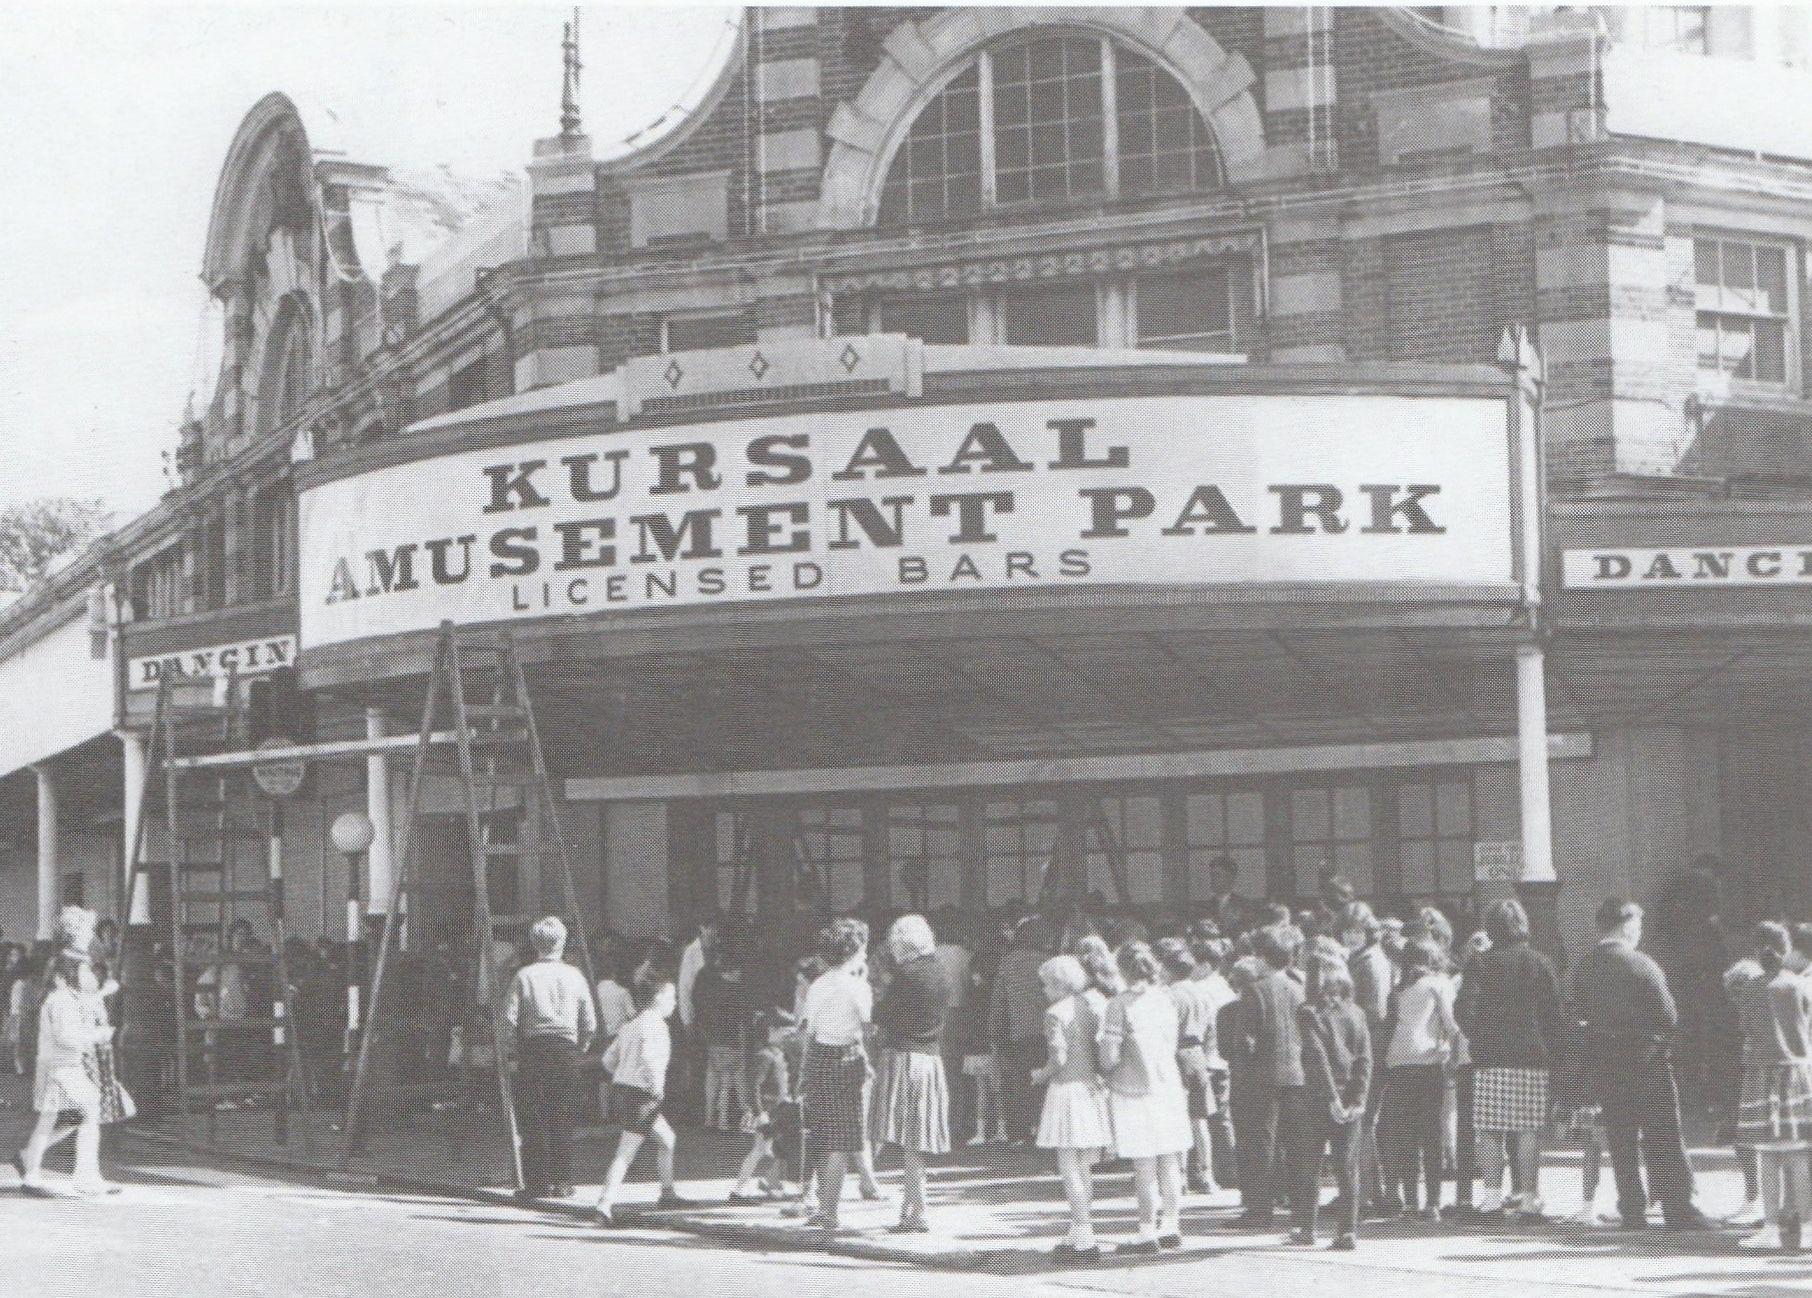 ad0760b104269c9990673fa0b57b0373 - Southend's Kursaal 50 years on